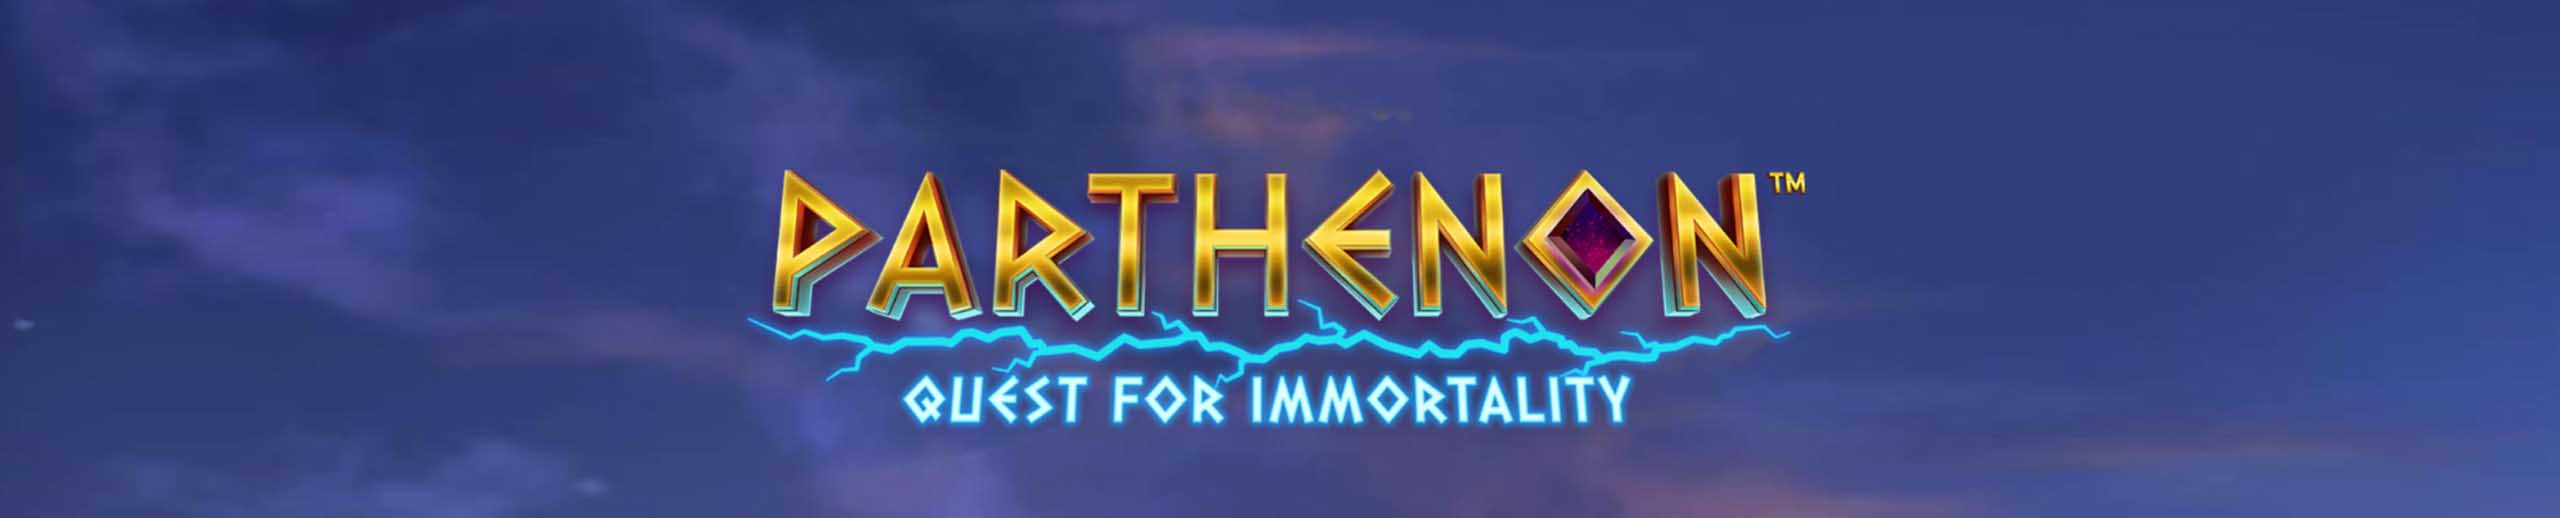 Parthenon Quest for Immortality NetEnt Spielautomat